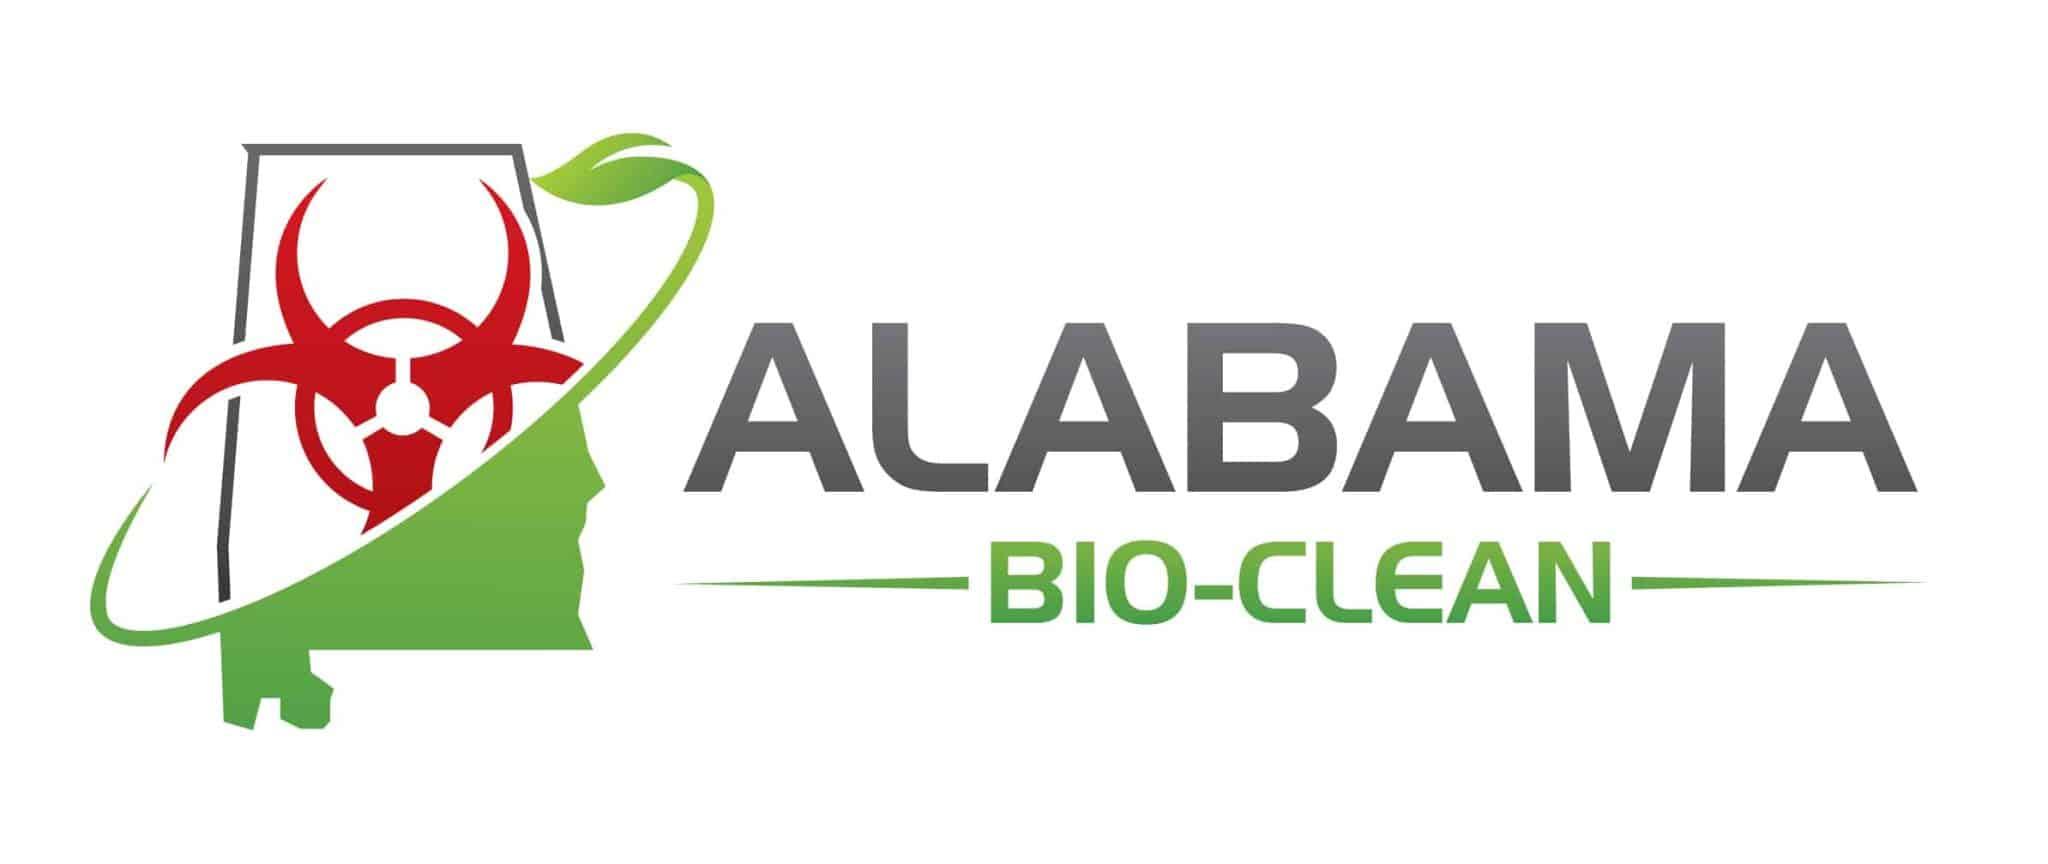 Alabama Bio Clean